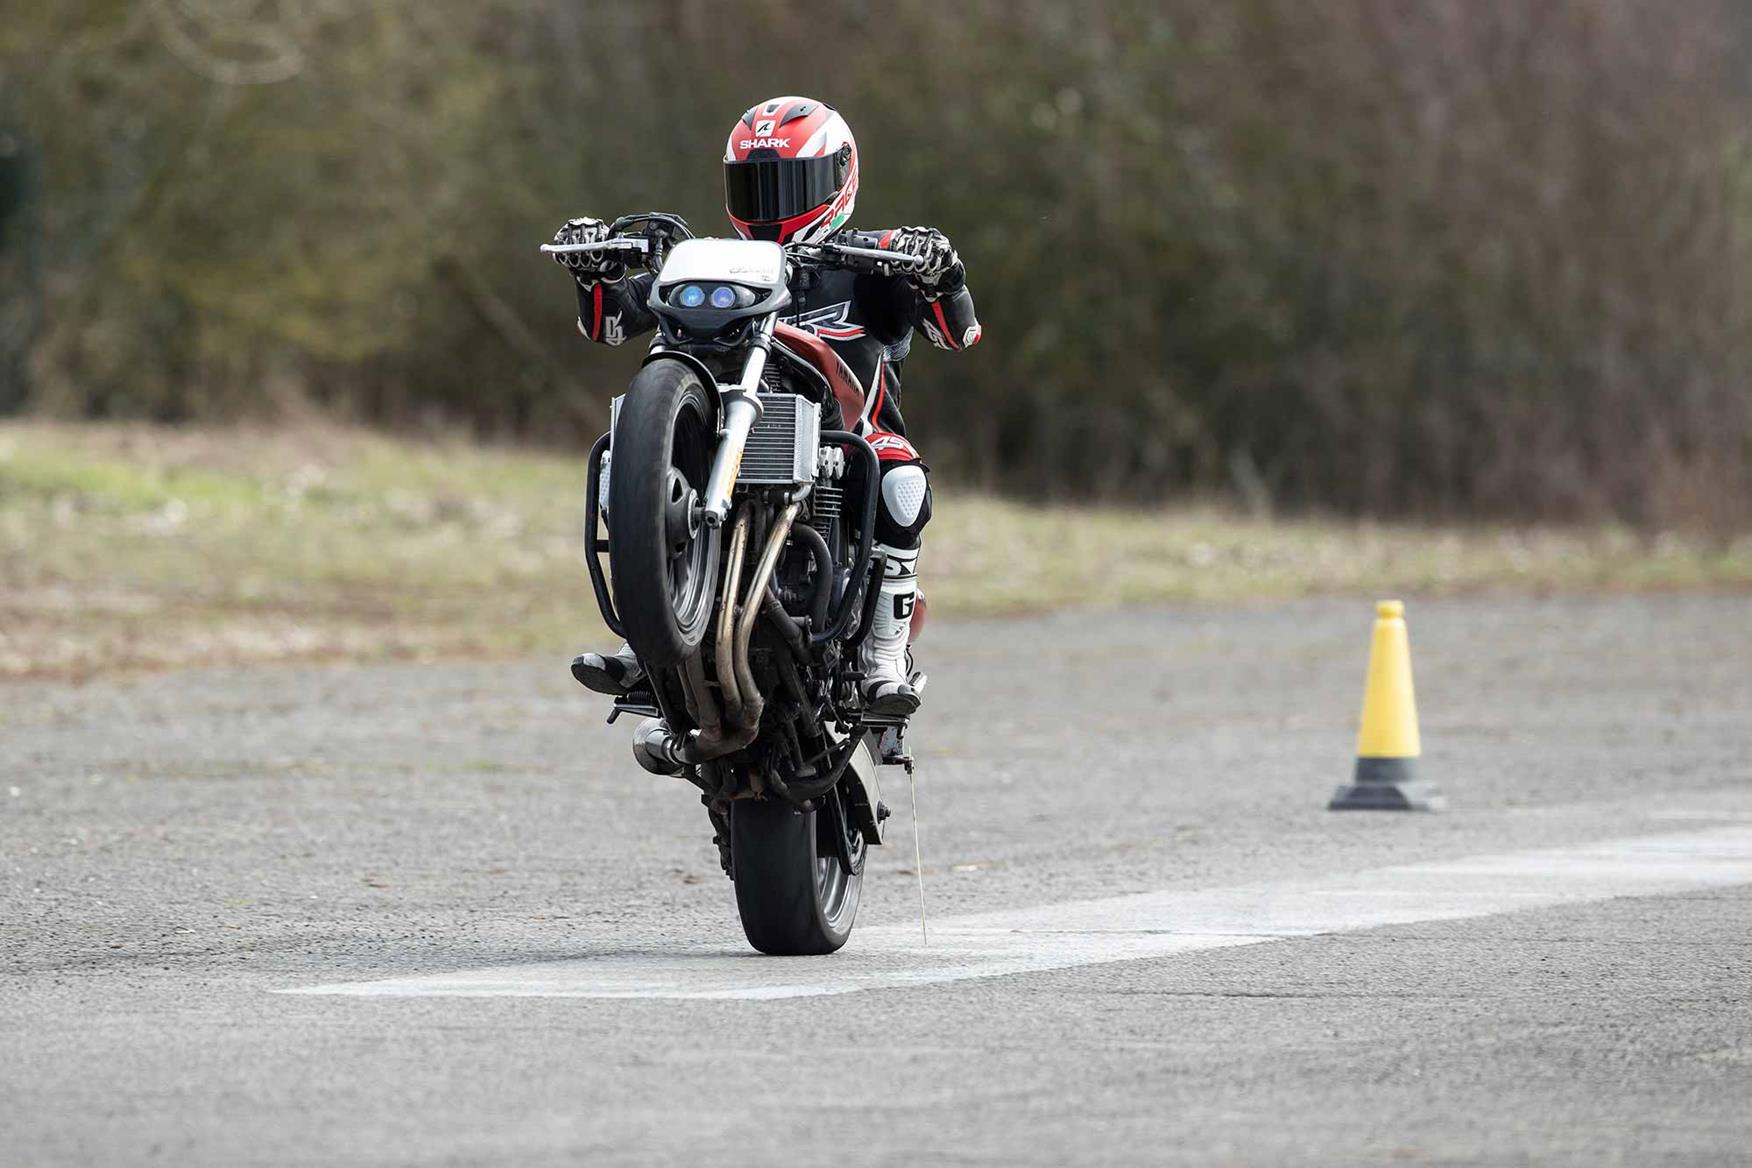 Throttle control is key for a wheelie